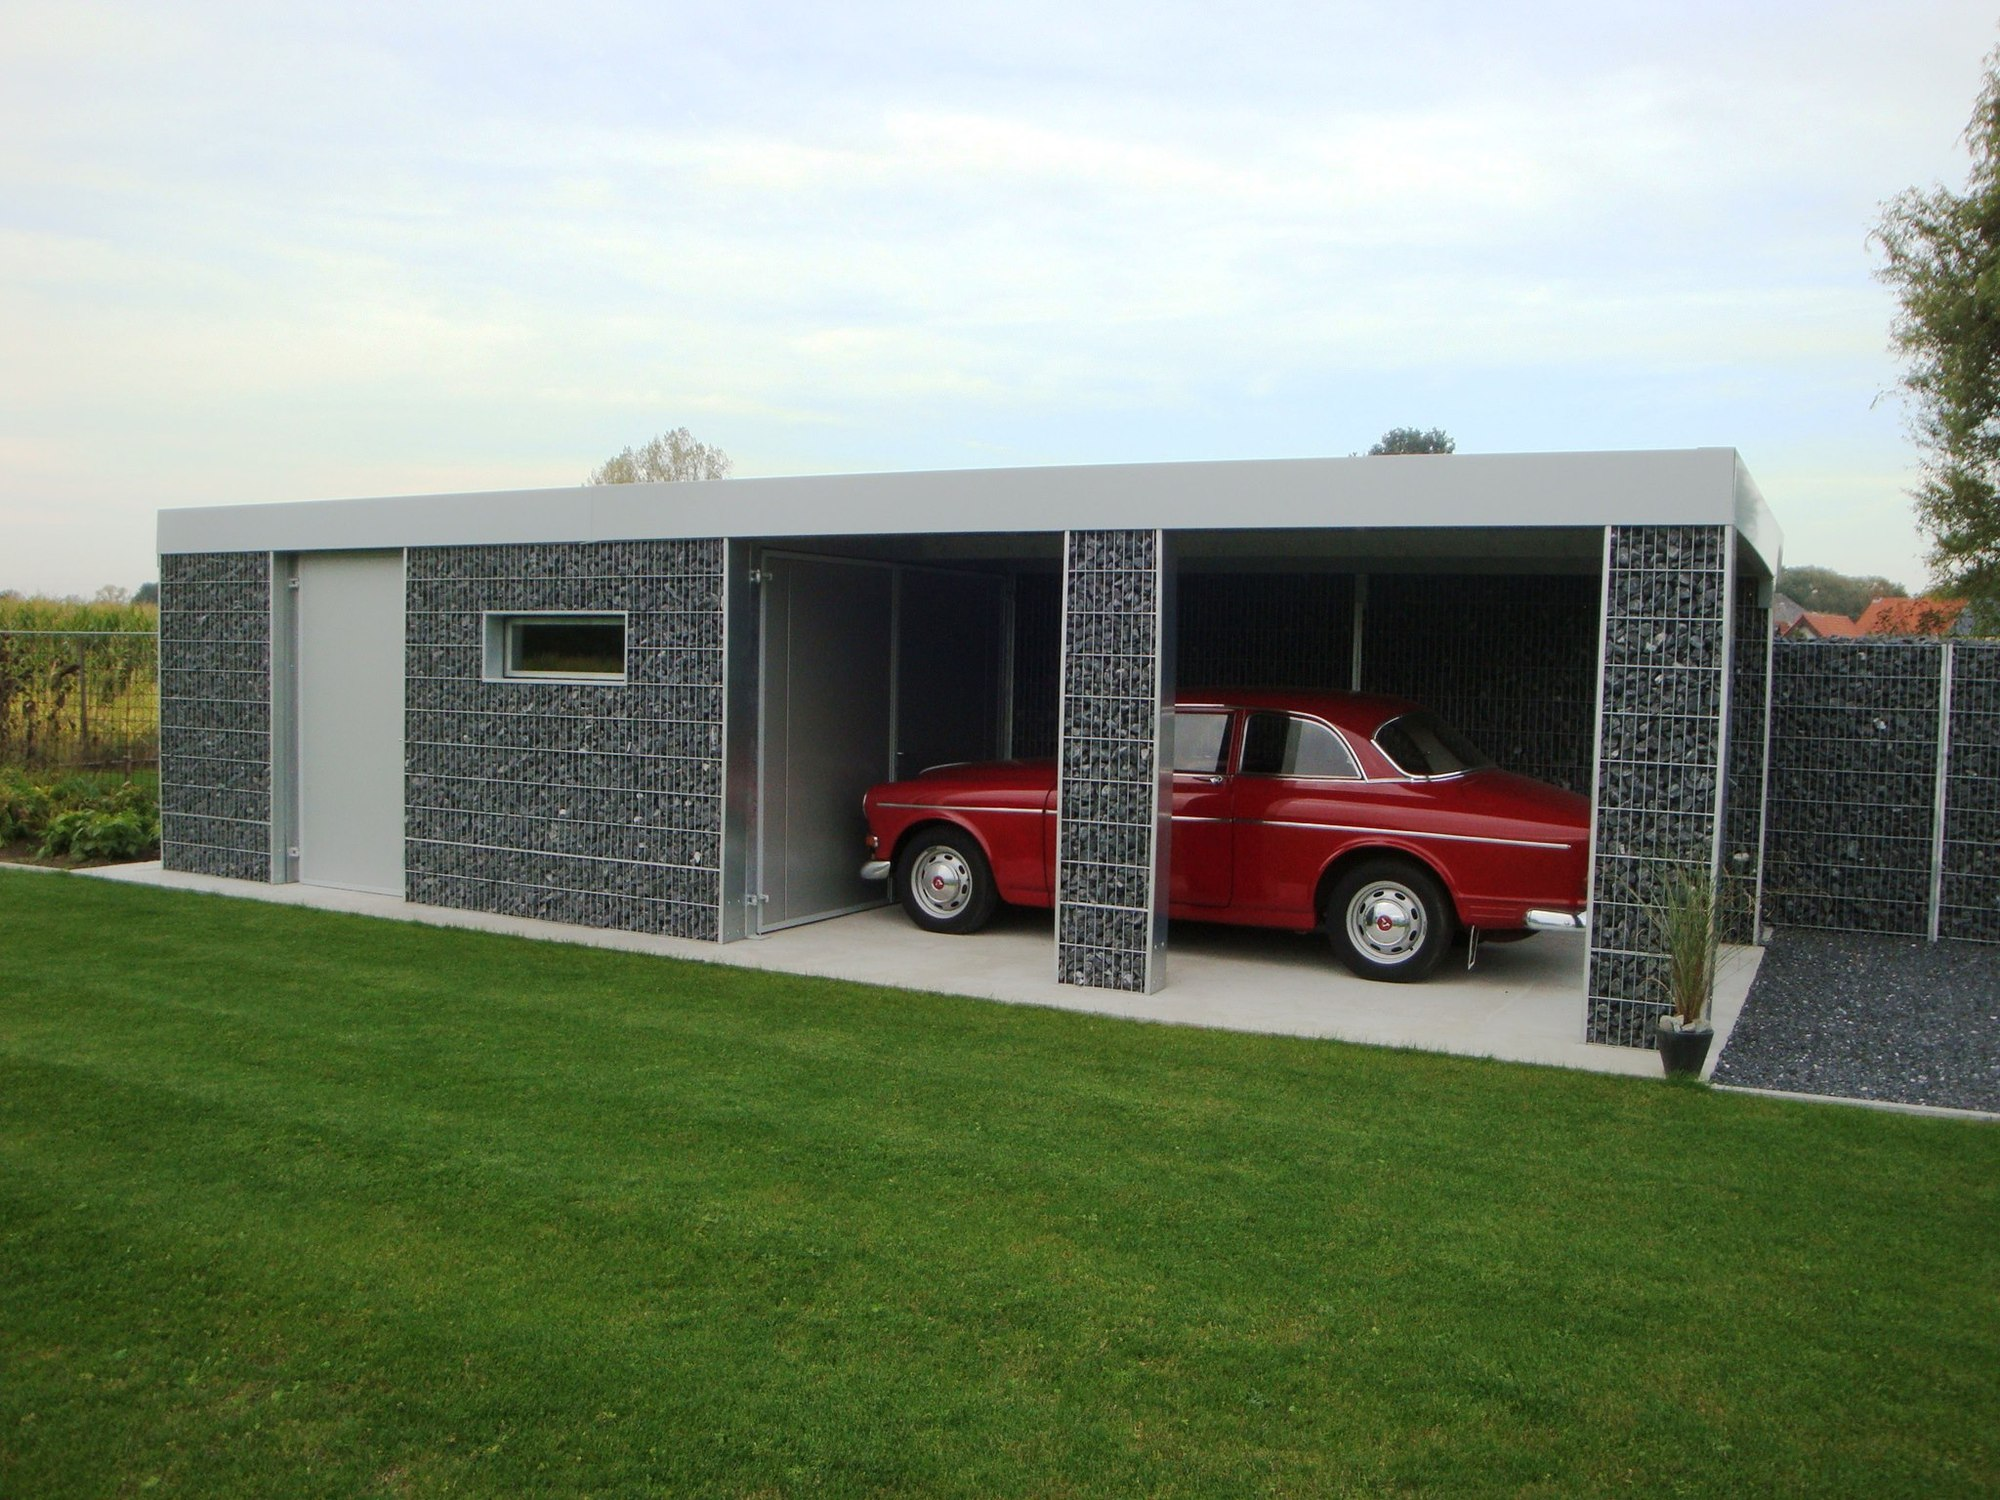 pin carport met berging on pinterest. Black Bedroom Furniture Sets. Home Design Ideas